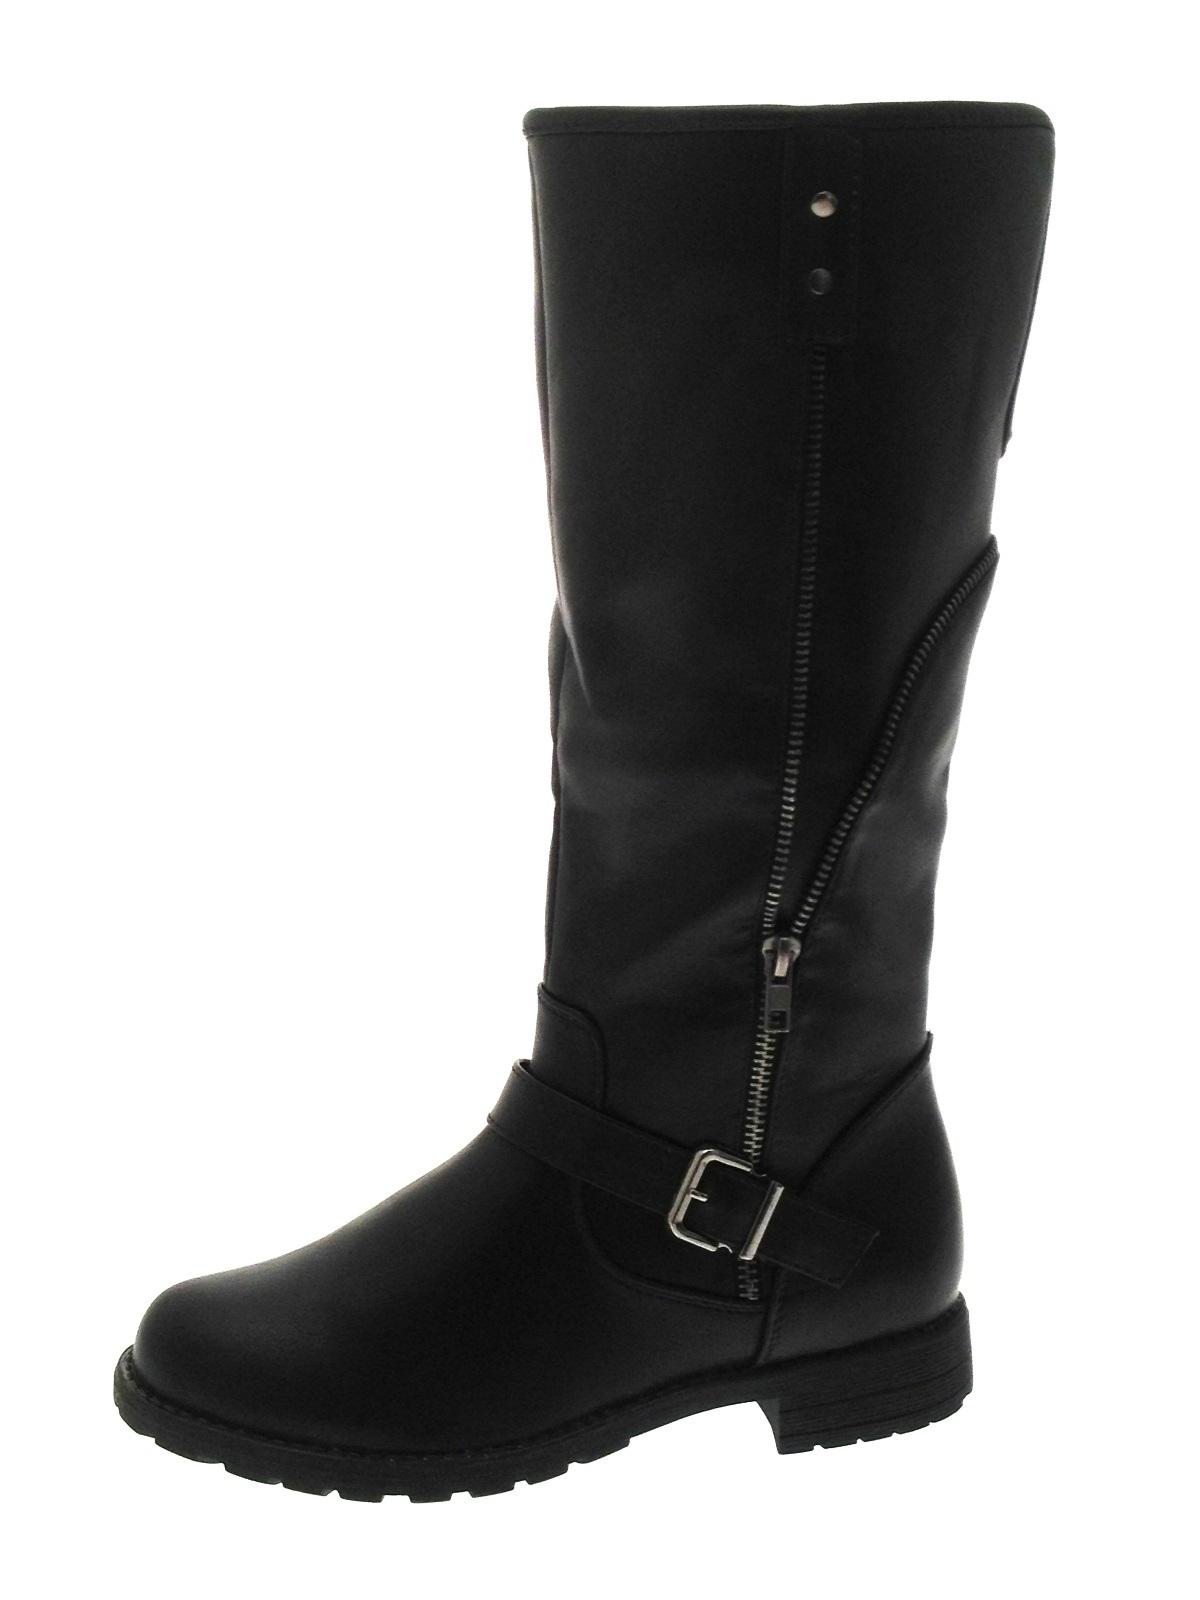 Amazing Ash Black Leather TOKYO Womens Biker Boot - Ash From Daniel Footwear UK